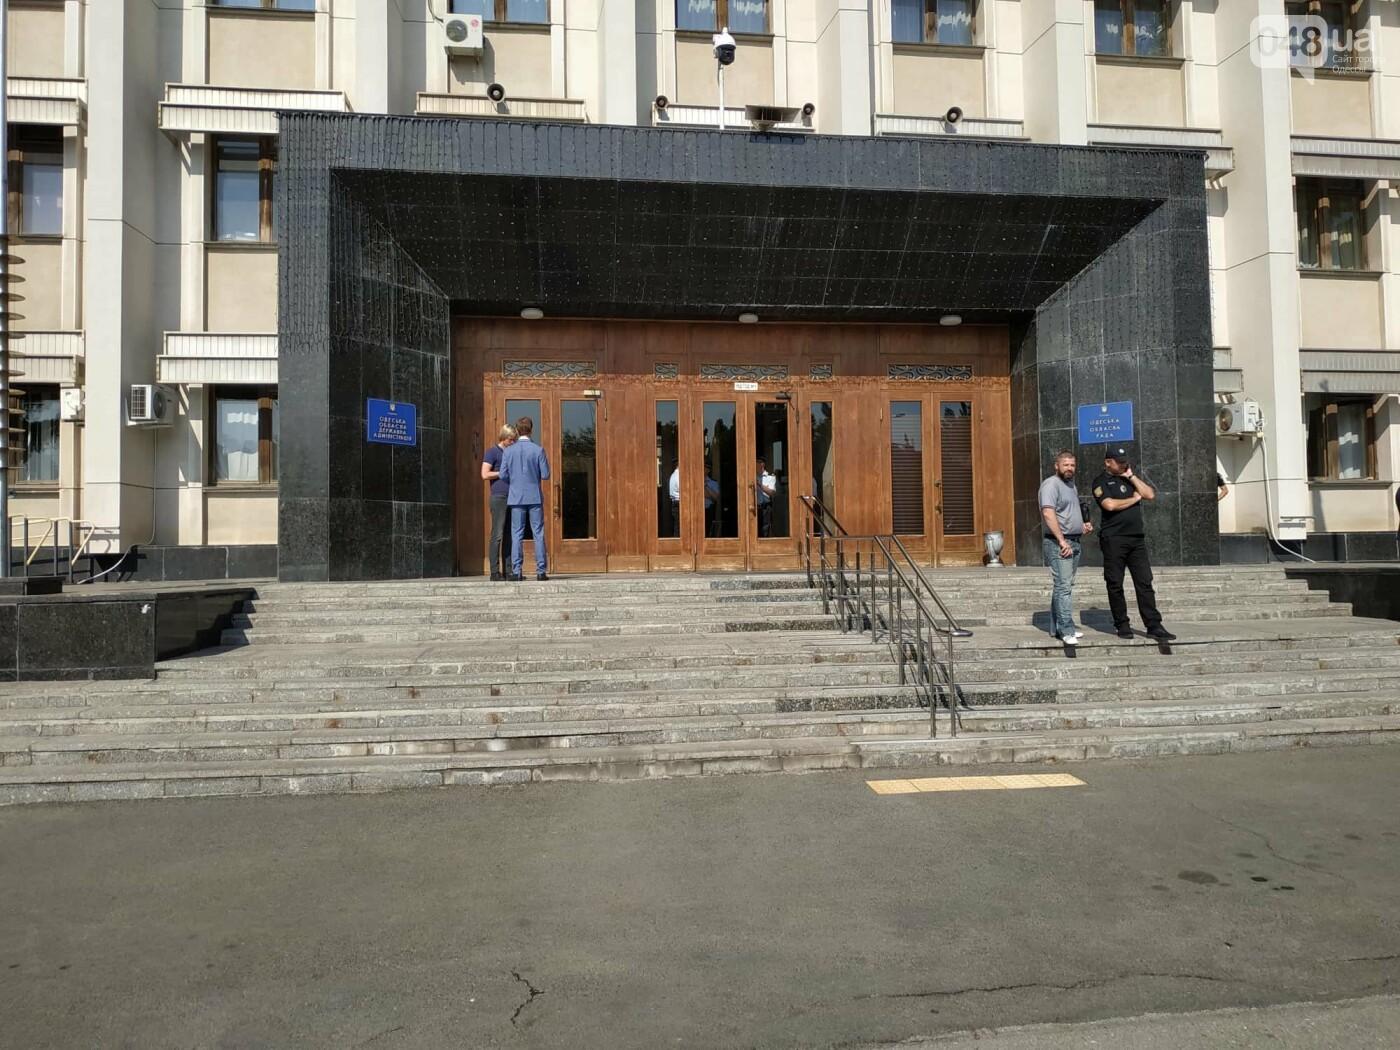 Стало известно, кто возглавил Одесский областной совет, - ФОТО, фото-6, Фото: Александр Жирносенко